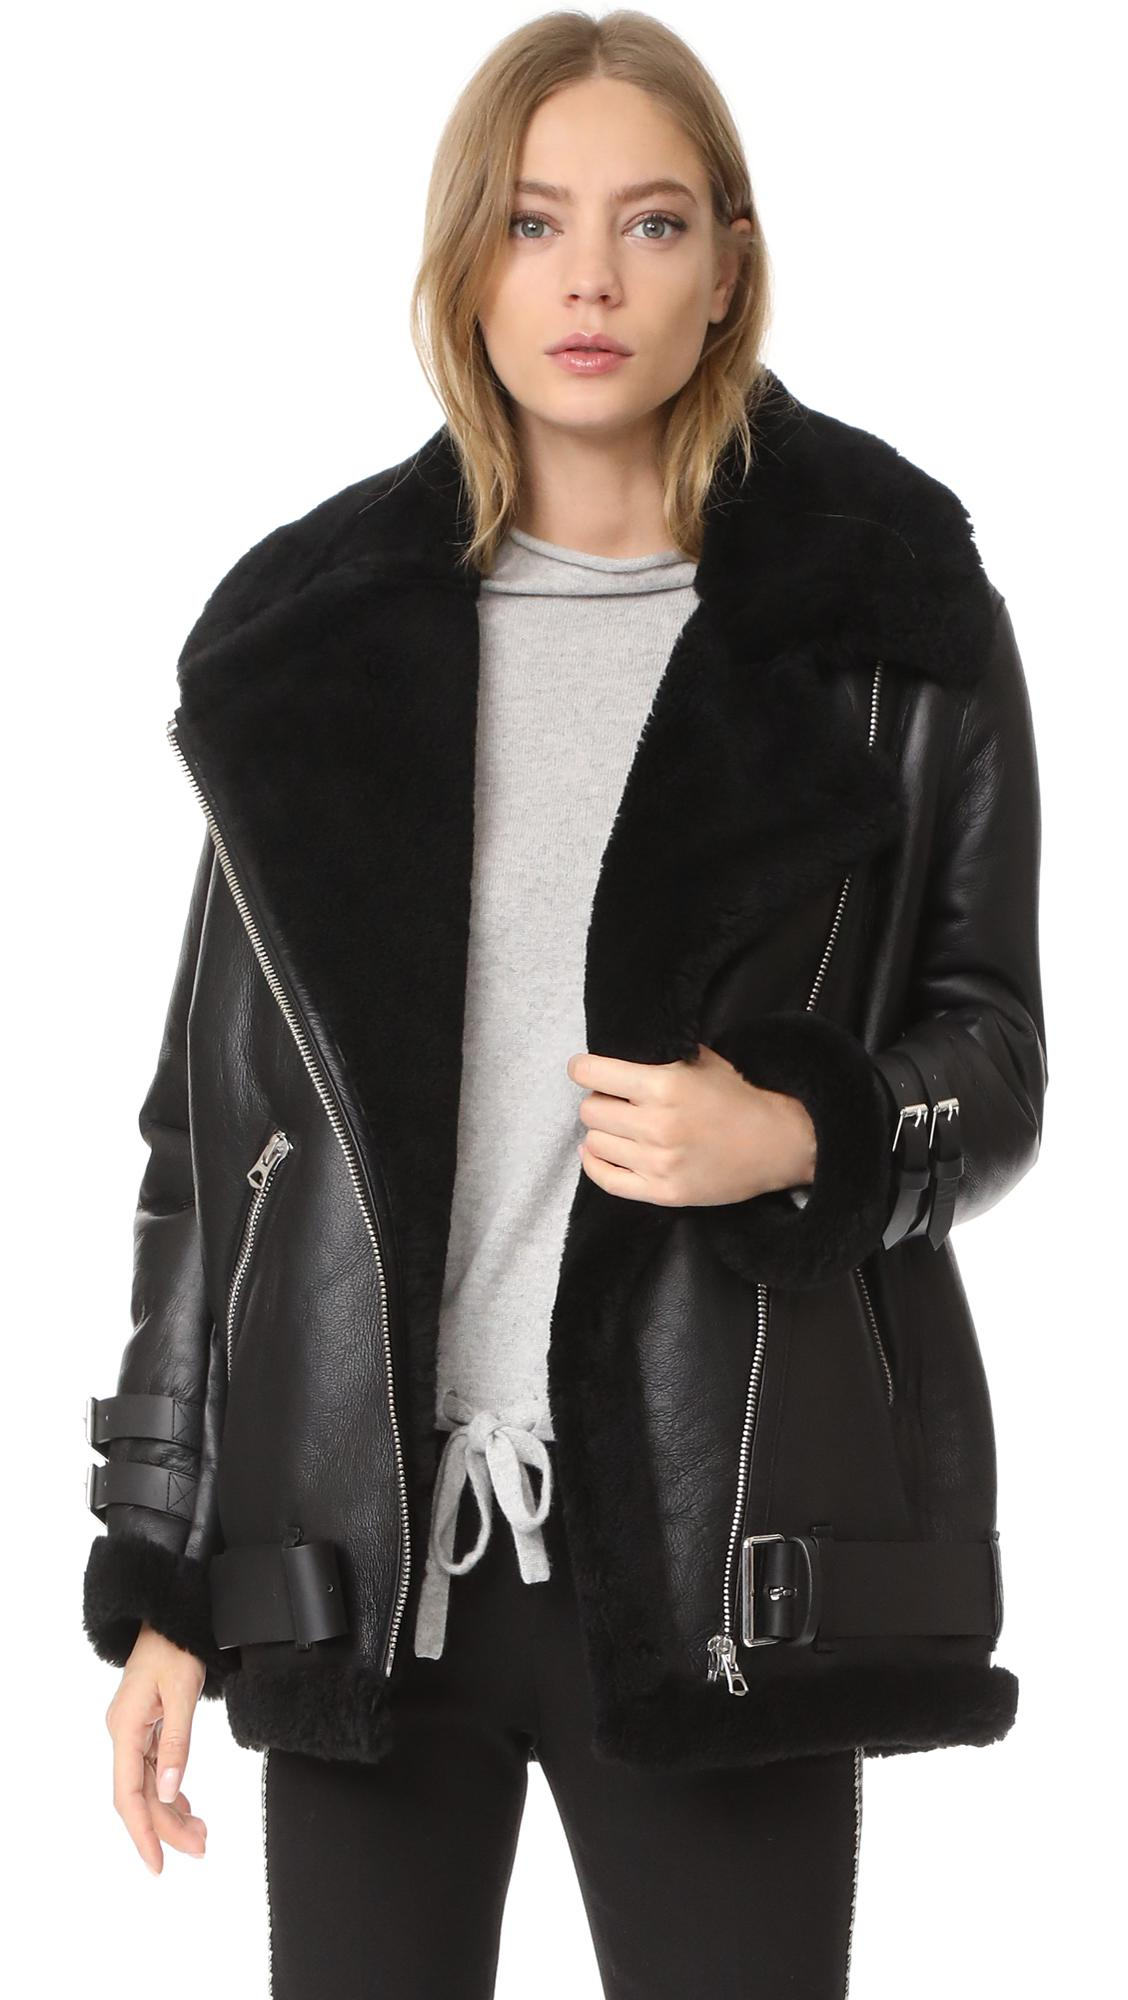 Acne Studios Leather Velocite Shearling Moto Jacket in ...